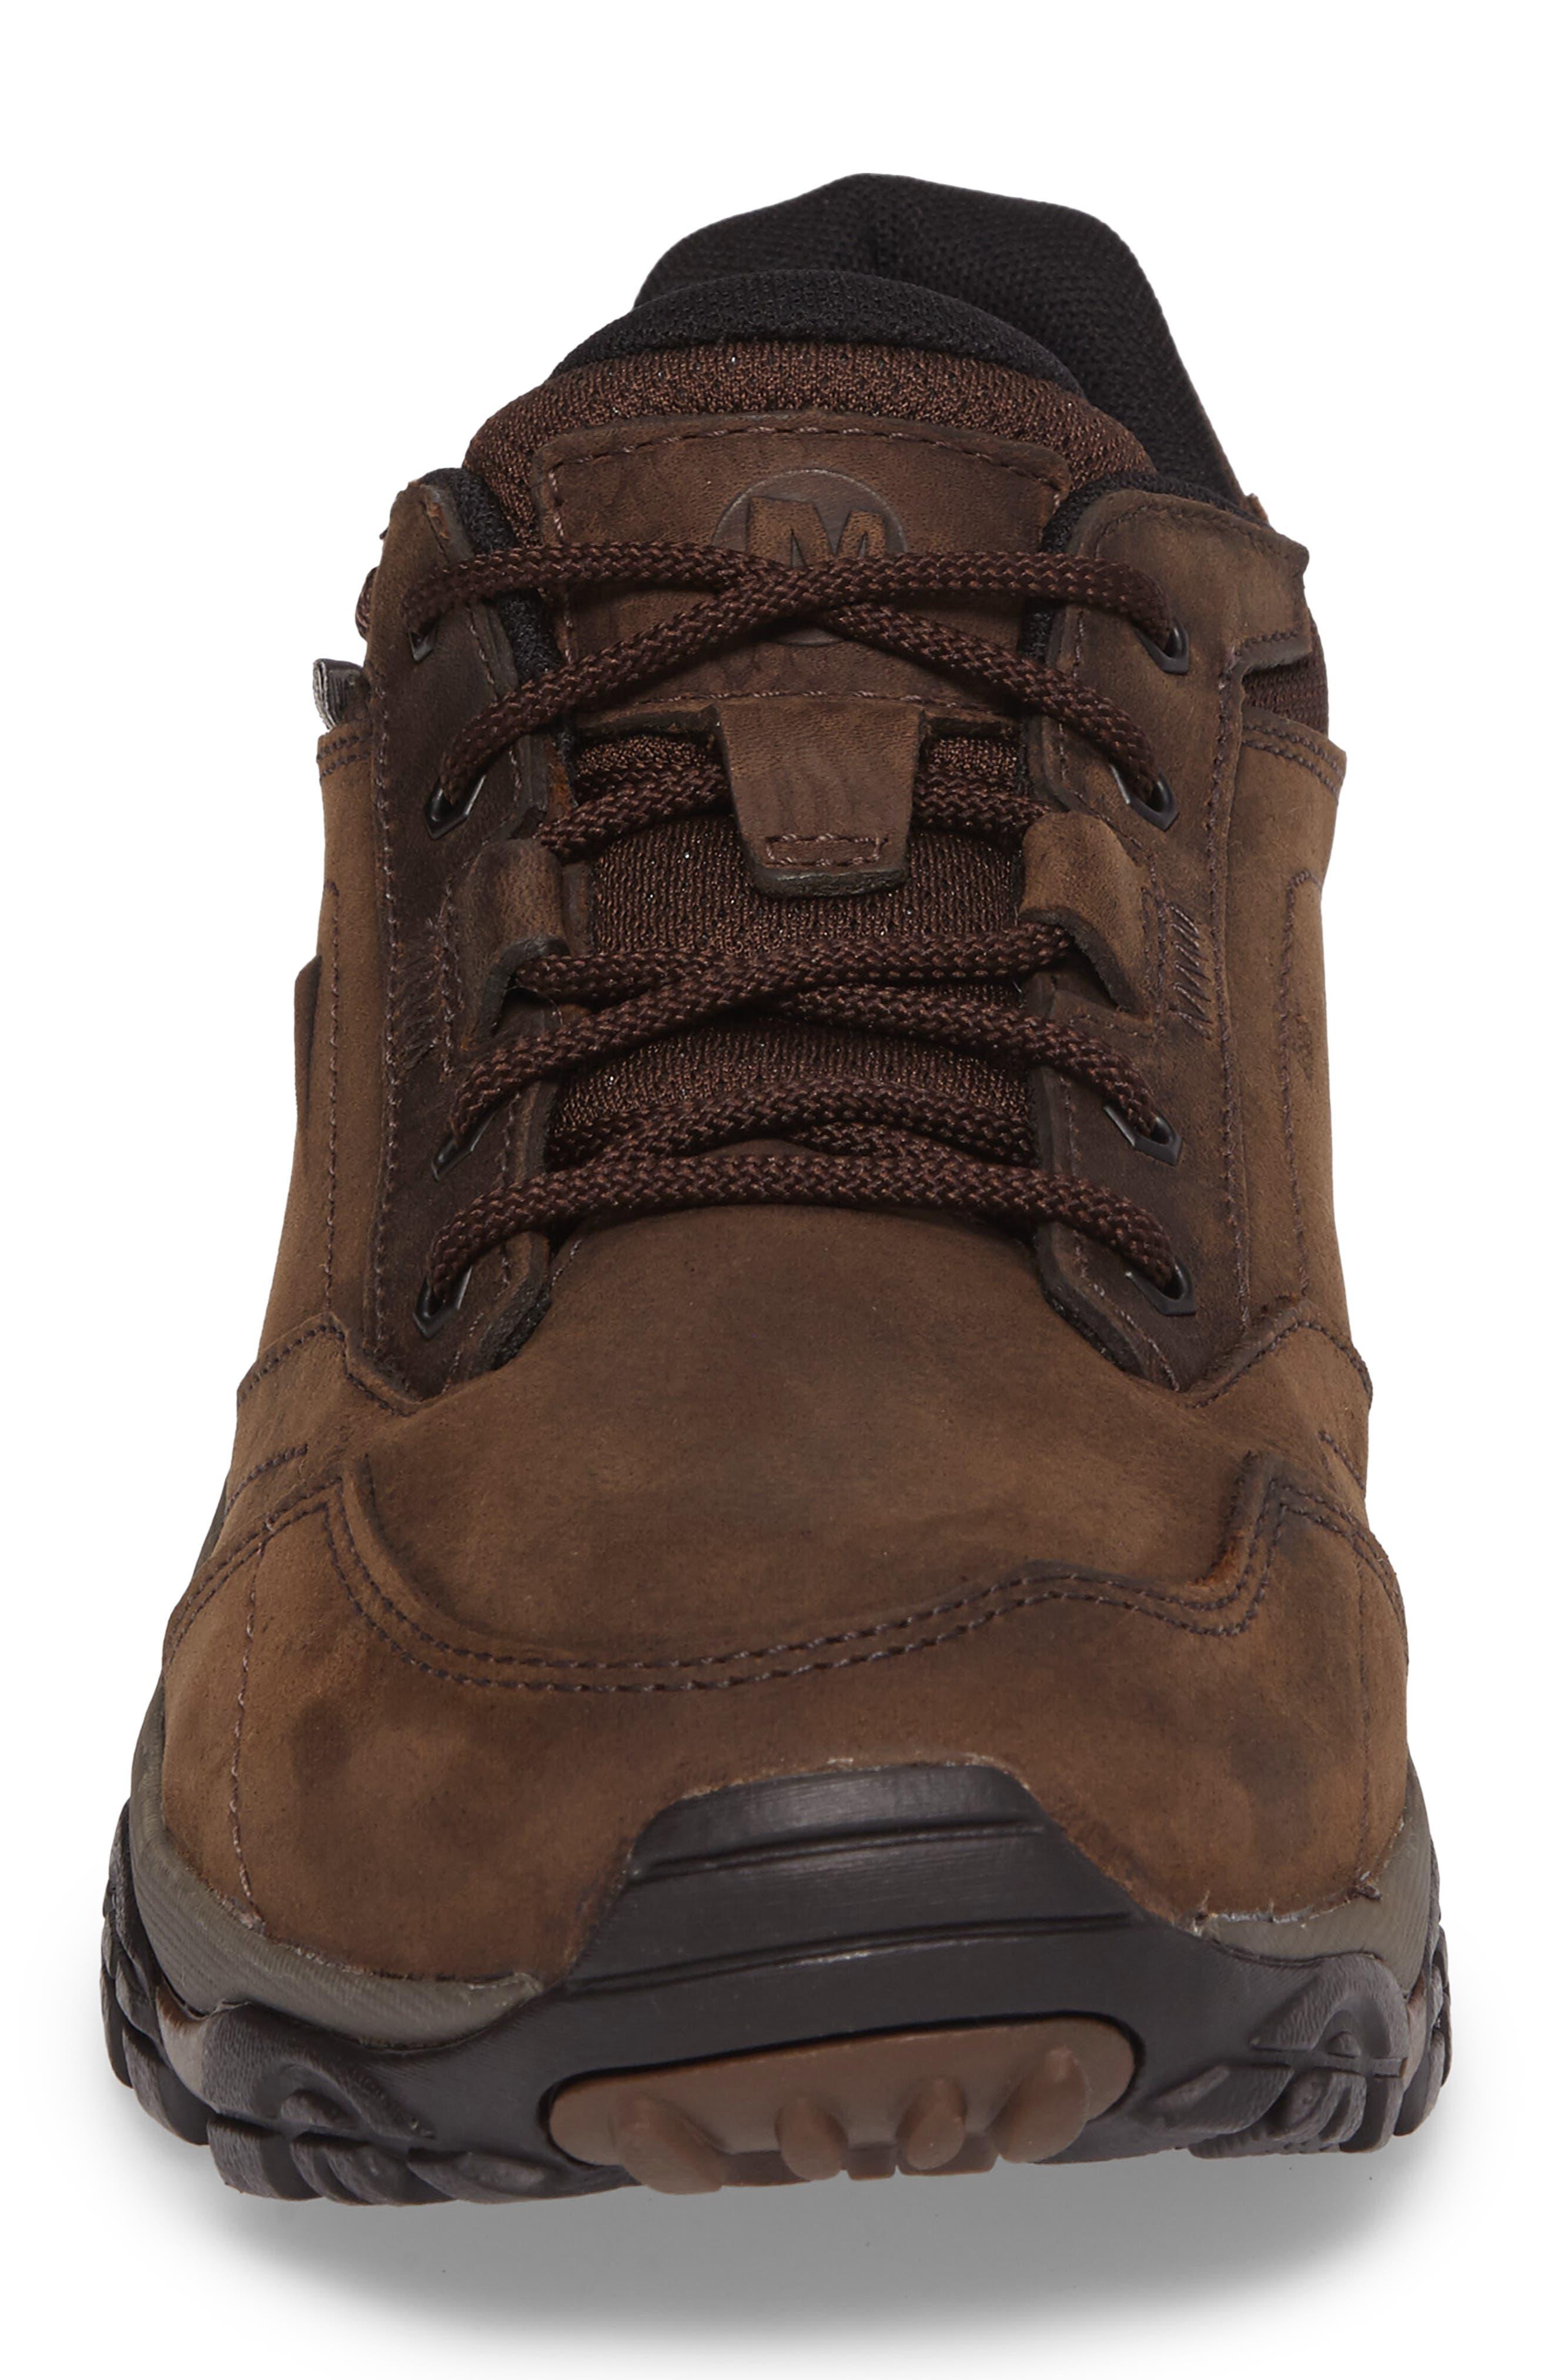 Moab Adventure Hiking Shoe,                             Alternate thumbnail 4, color,                             Dark Earth Nubuck Leather